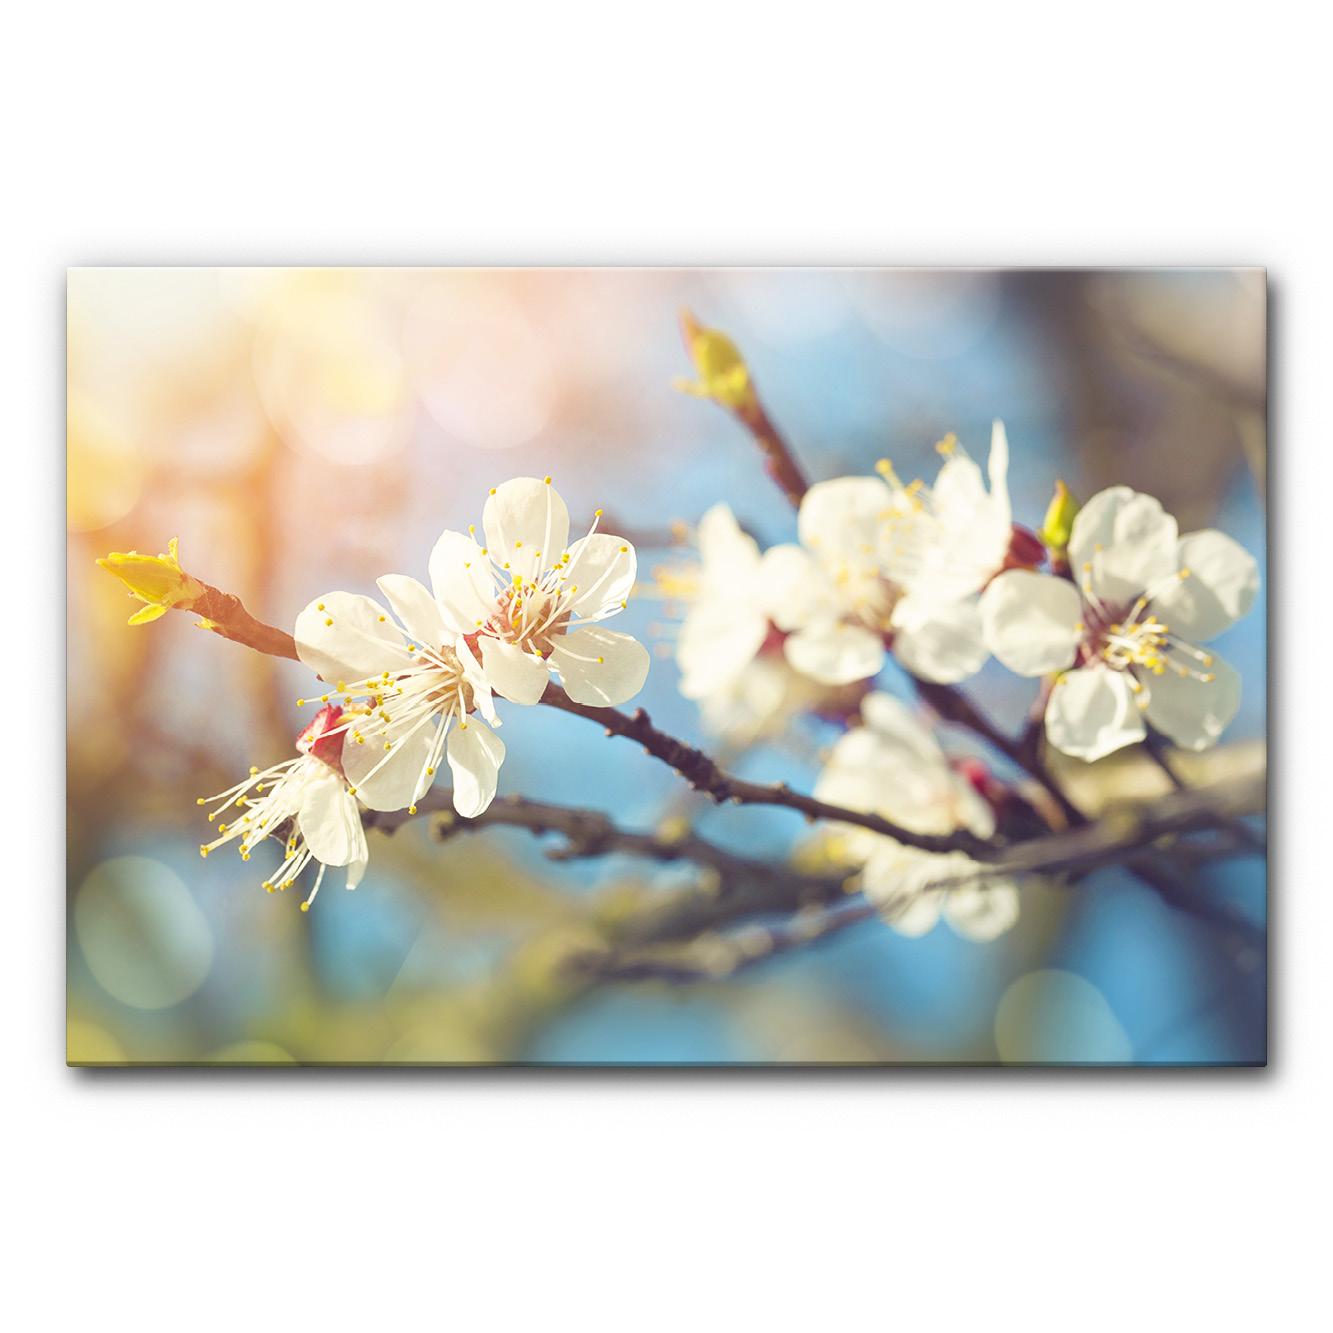 Schallabsorberbild Kirschblüte 1 im Format 120x80 cm